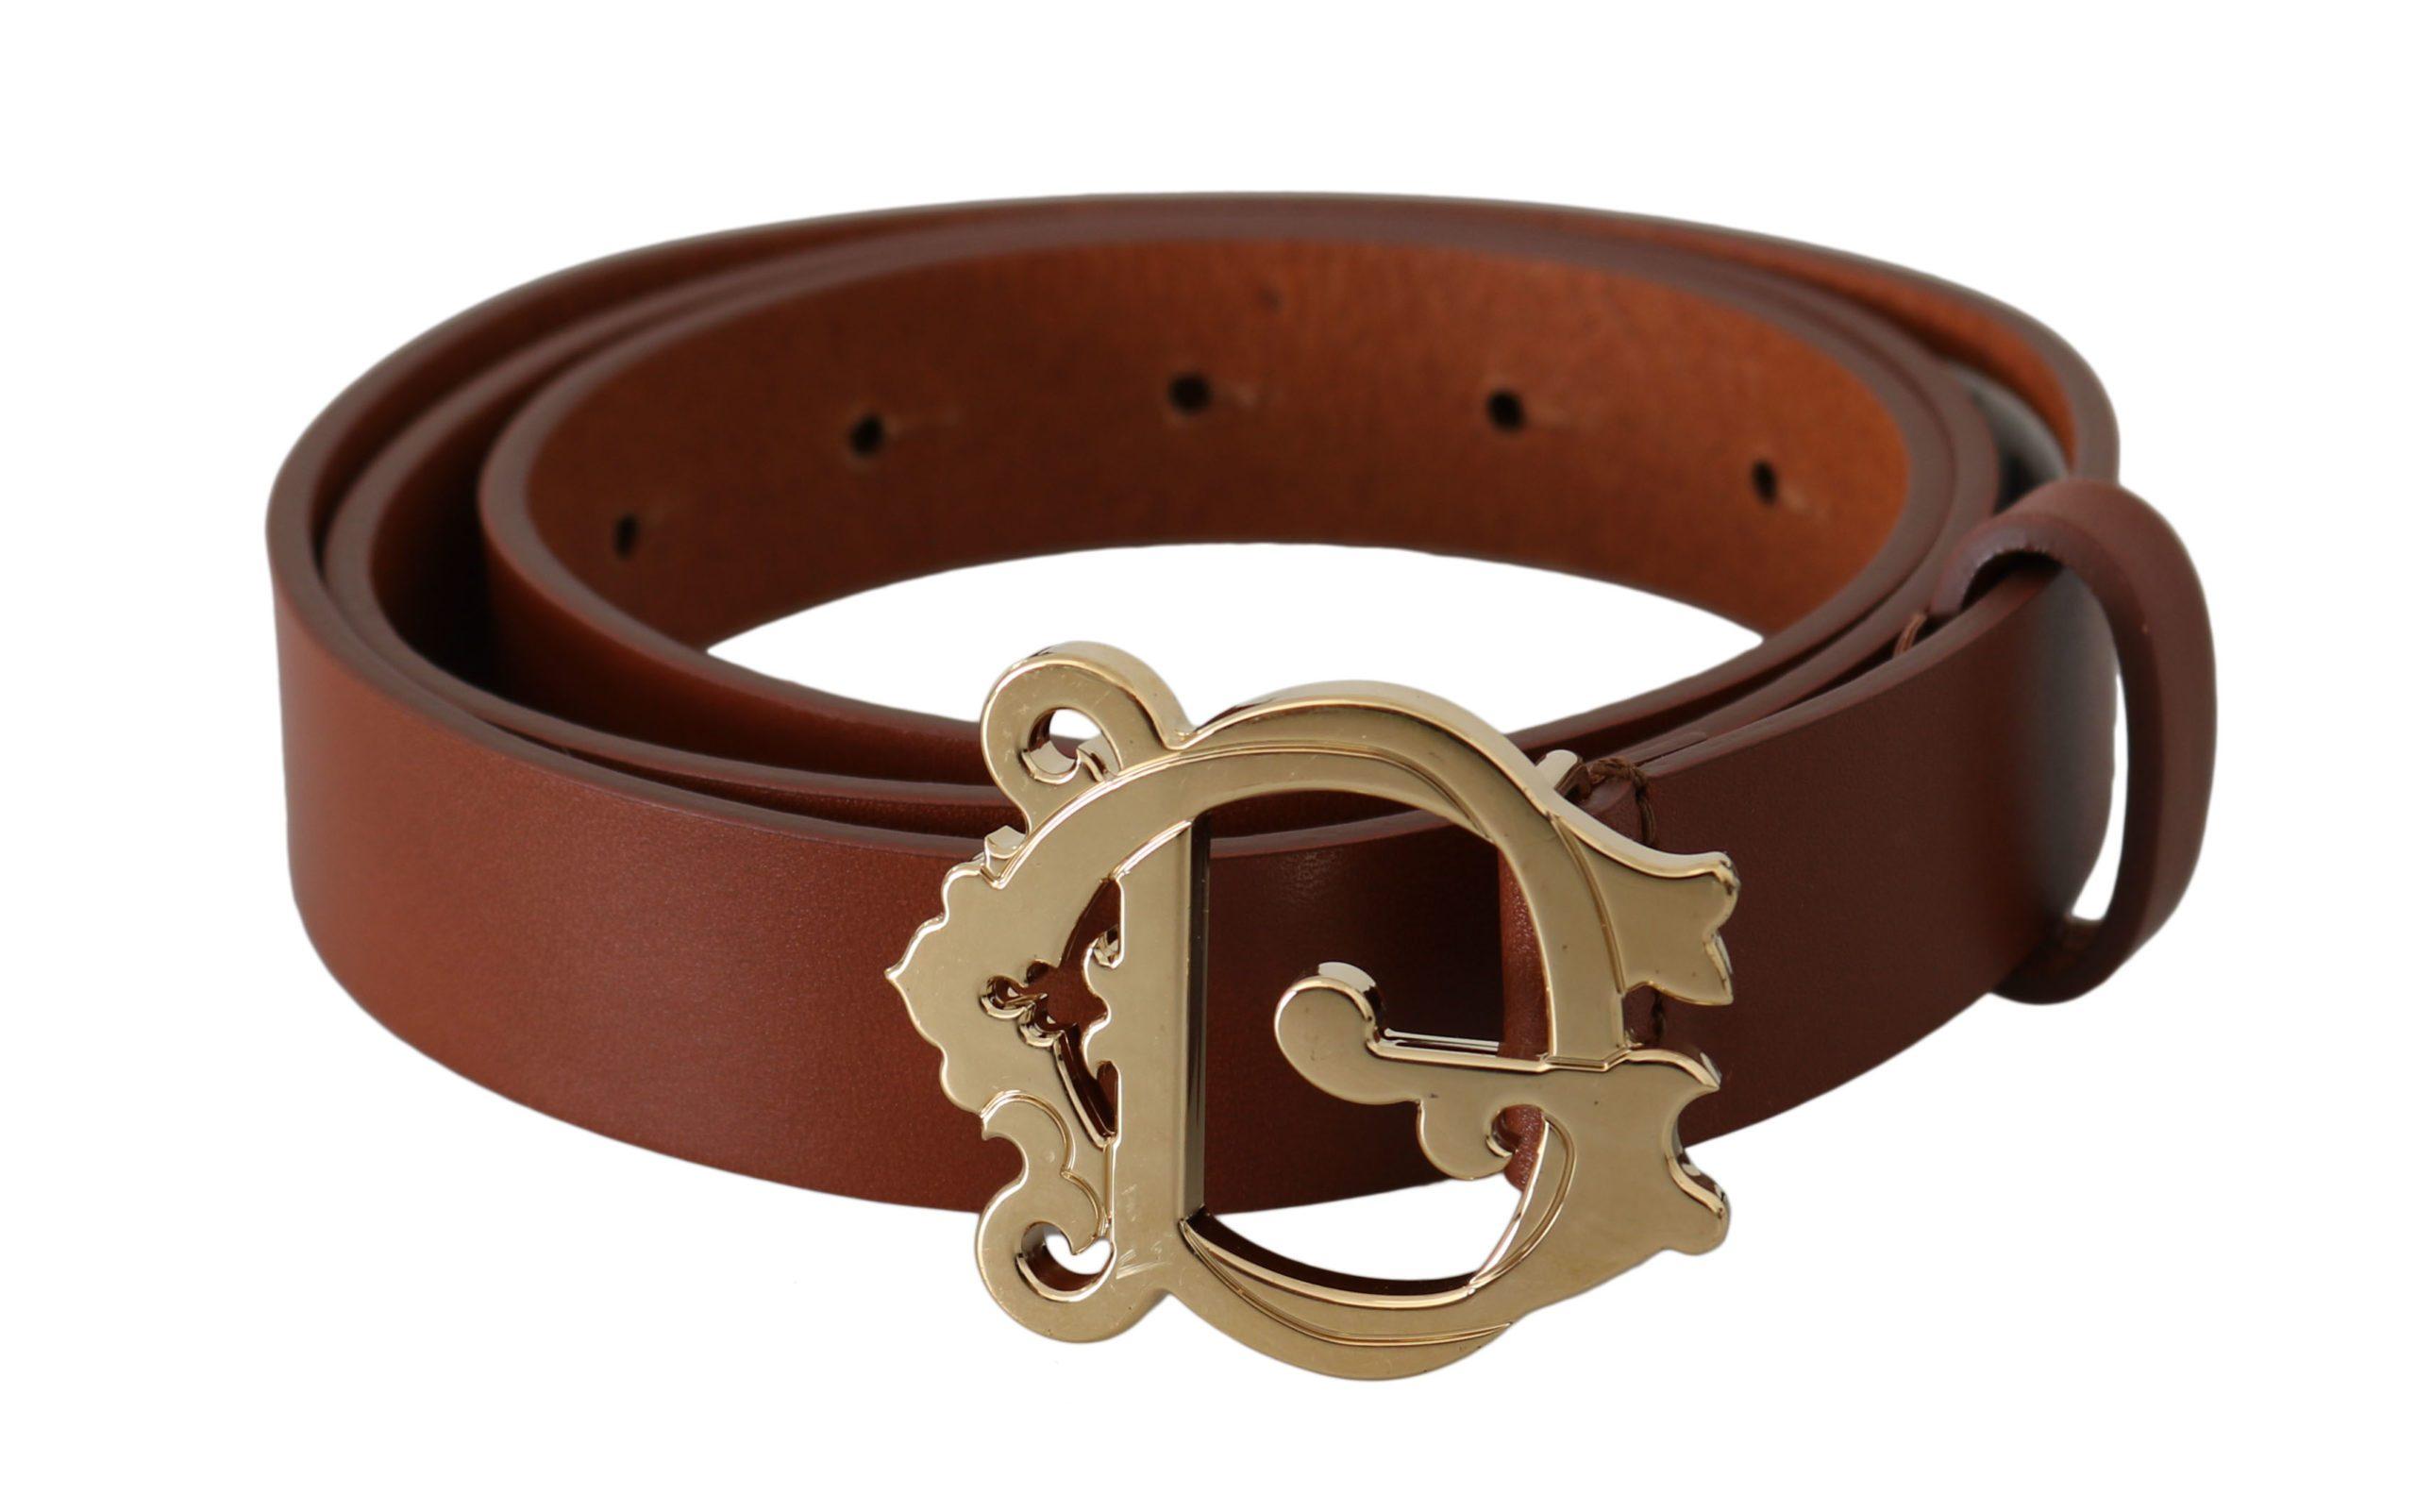 Dolce & Gabbana Women's Leather Baroque Buckle Belt Brown BEL60834 - 90 cm / 36 Inches